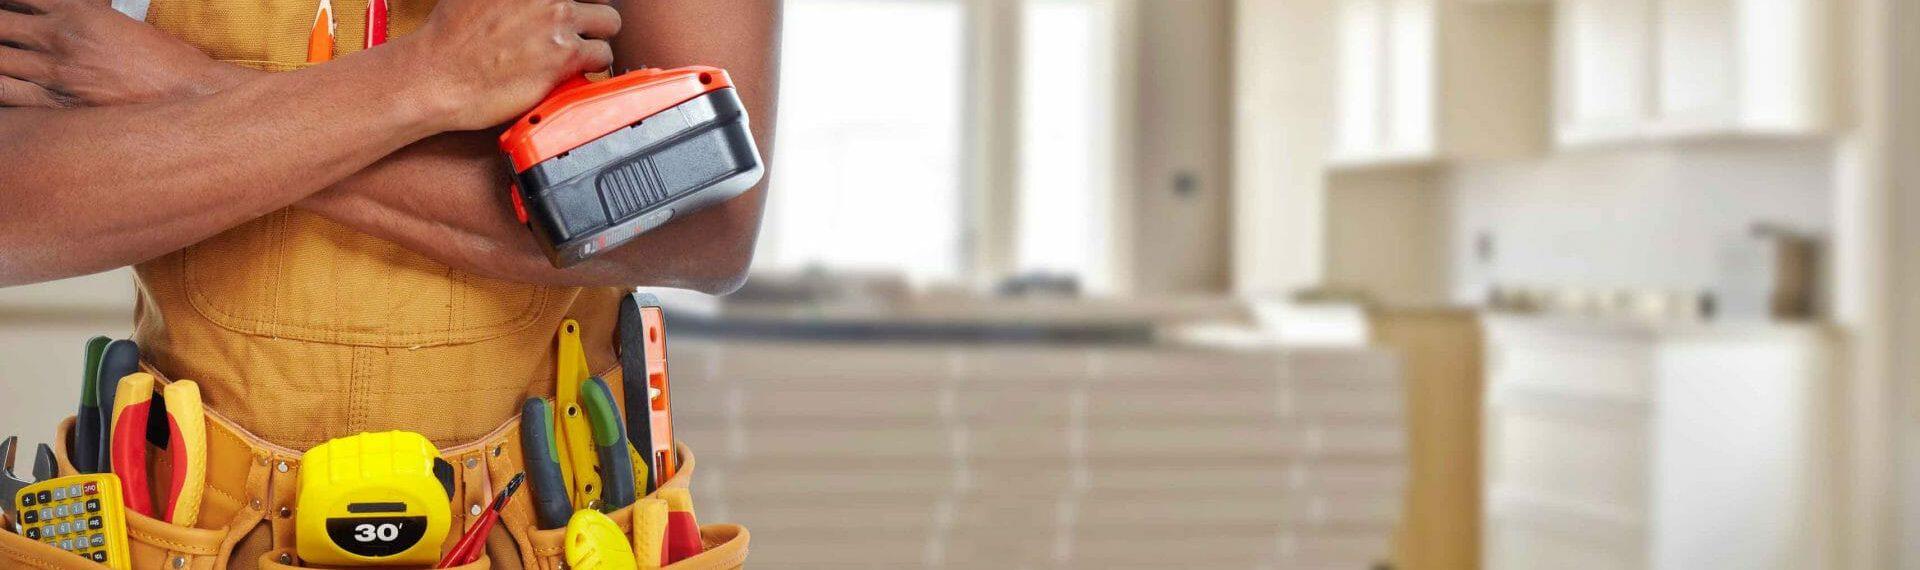 Self-Employed Handyman: What Insurance Do You Need?